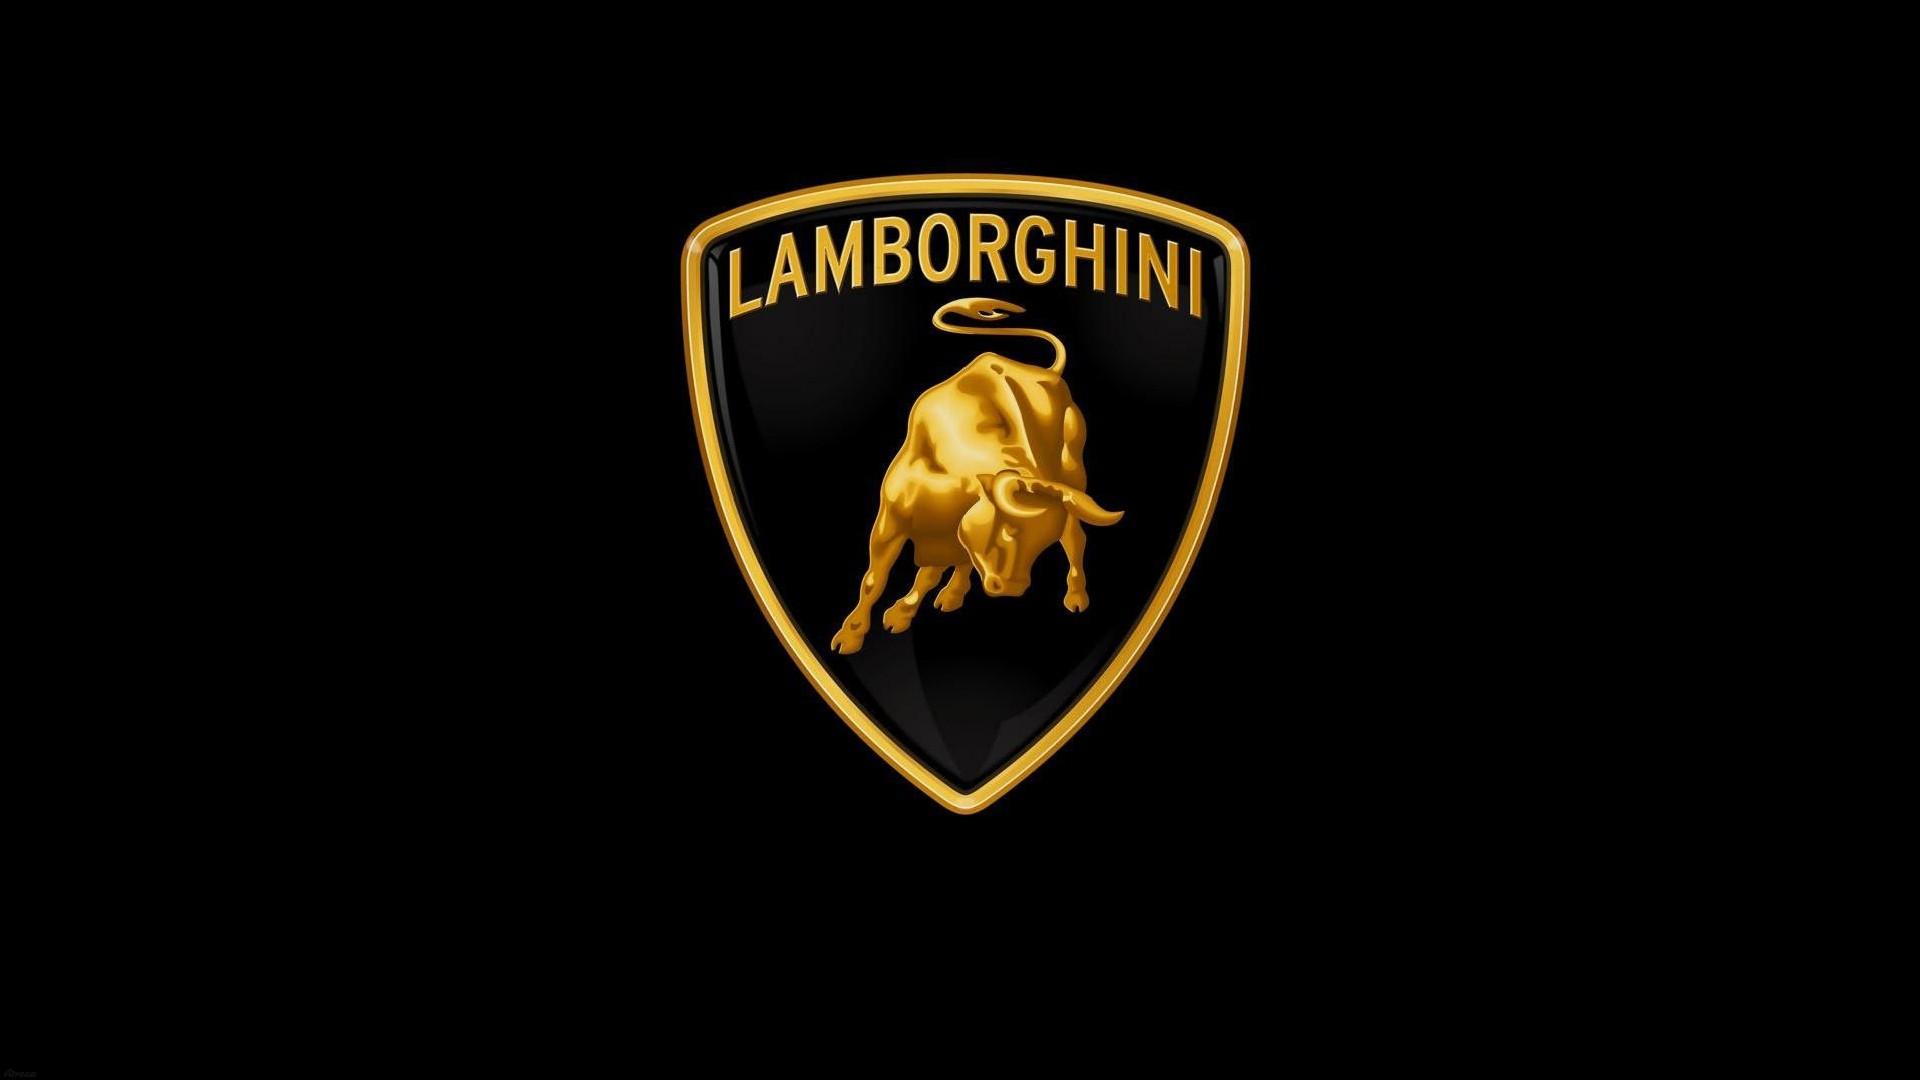 Lamborghini Logo Hd Wallpaper Achtergrond 1920x1080 Id 273980